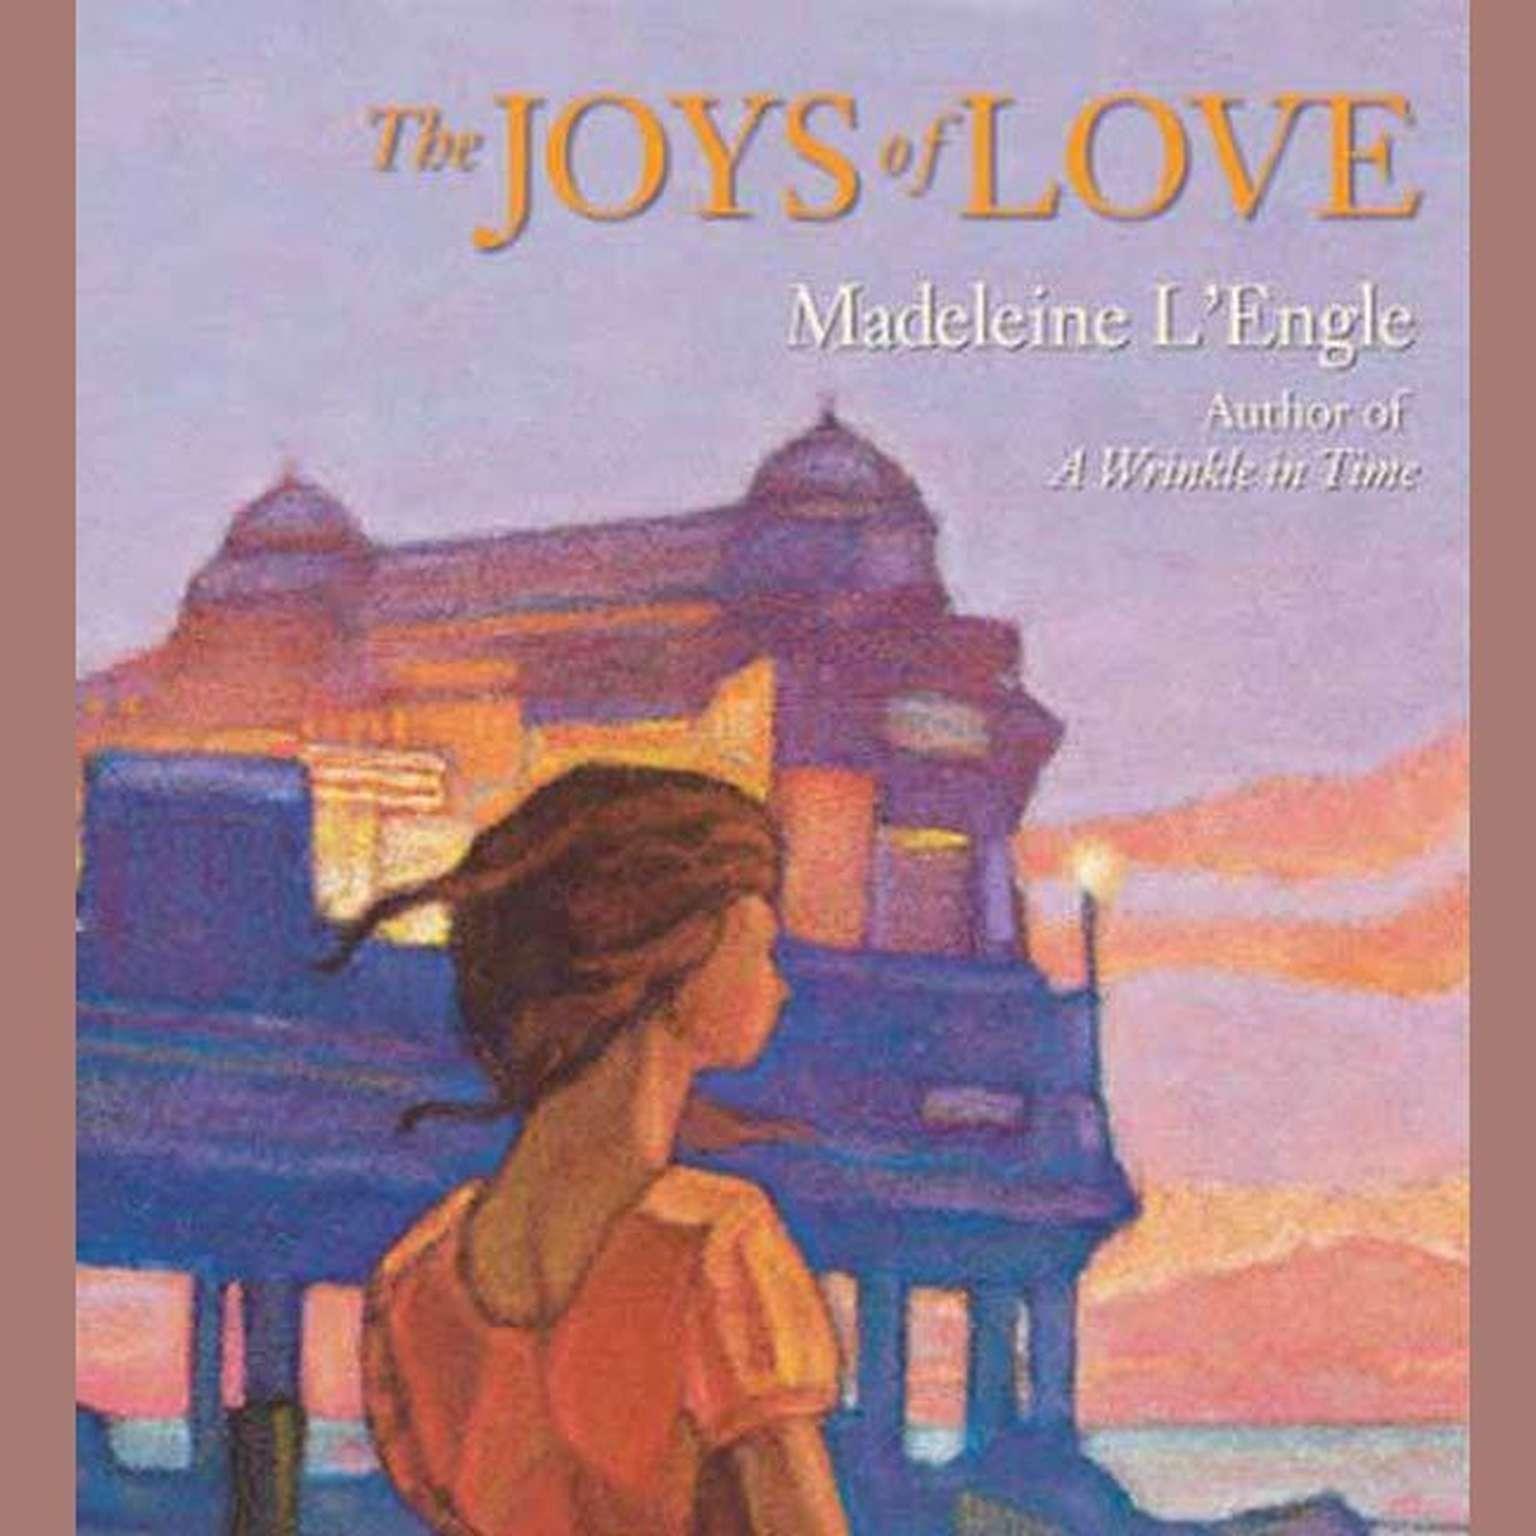 Printable The Joys of Love Audiobook Cover Art